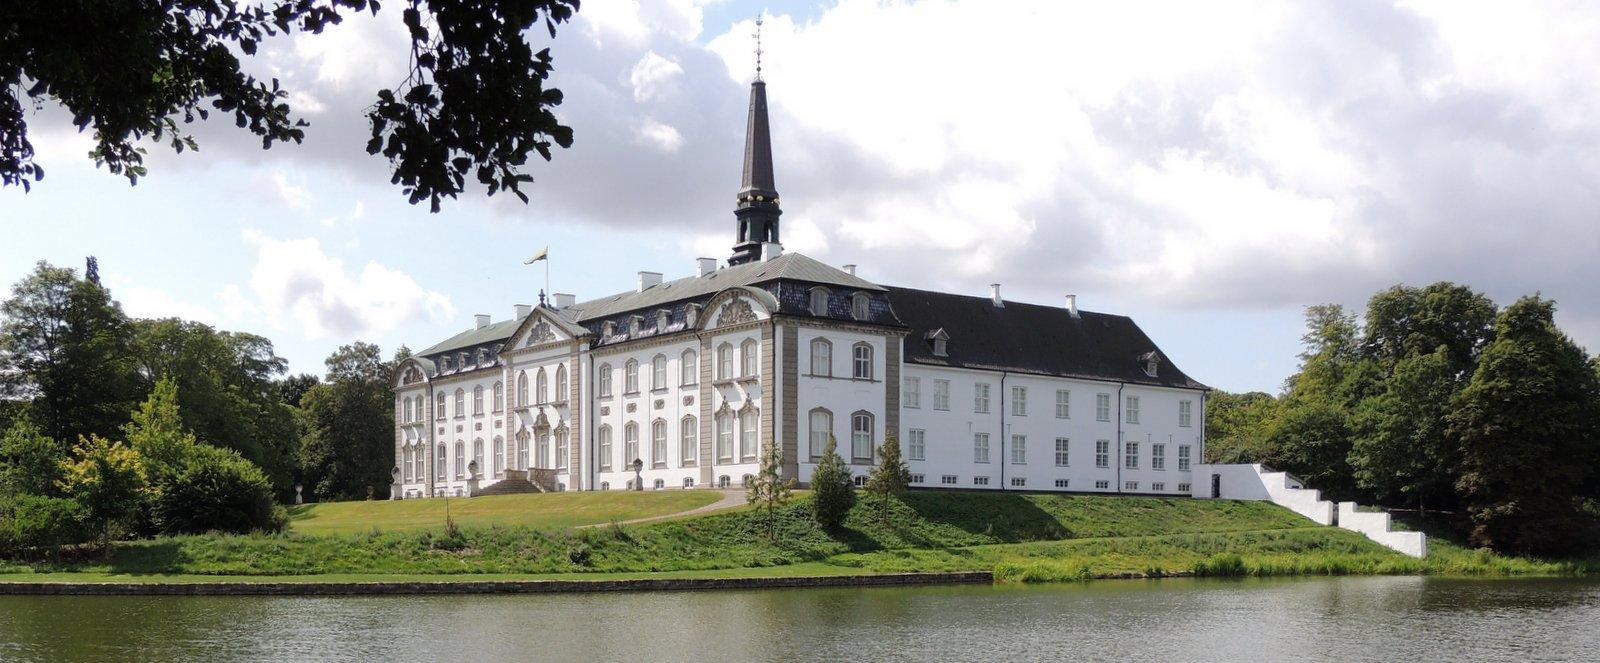 Schloss Bregentved